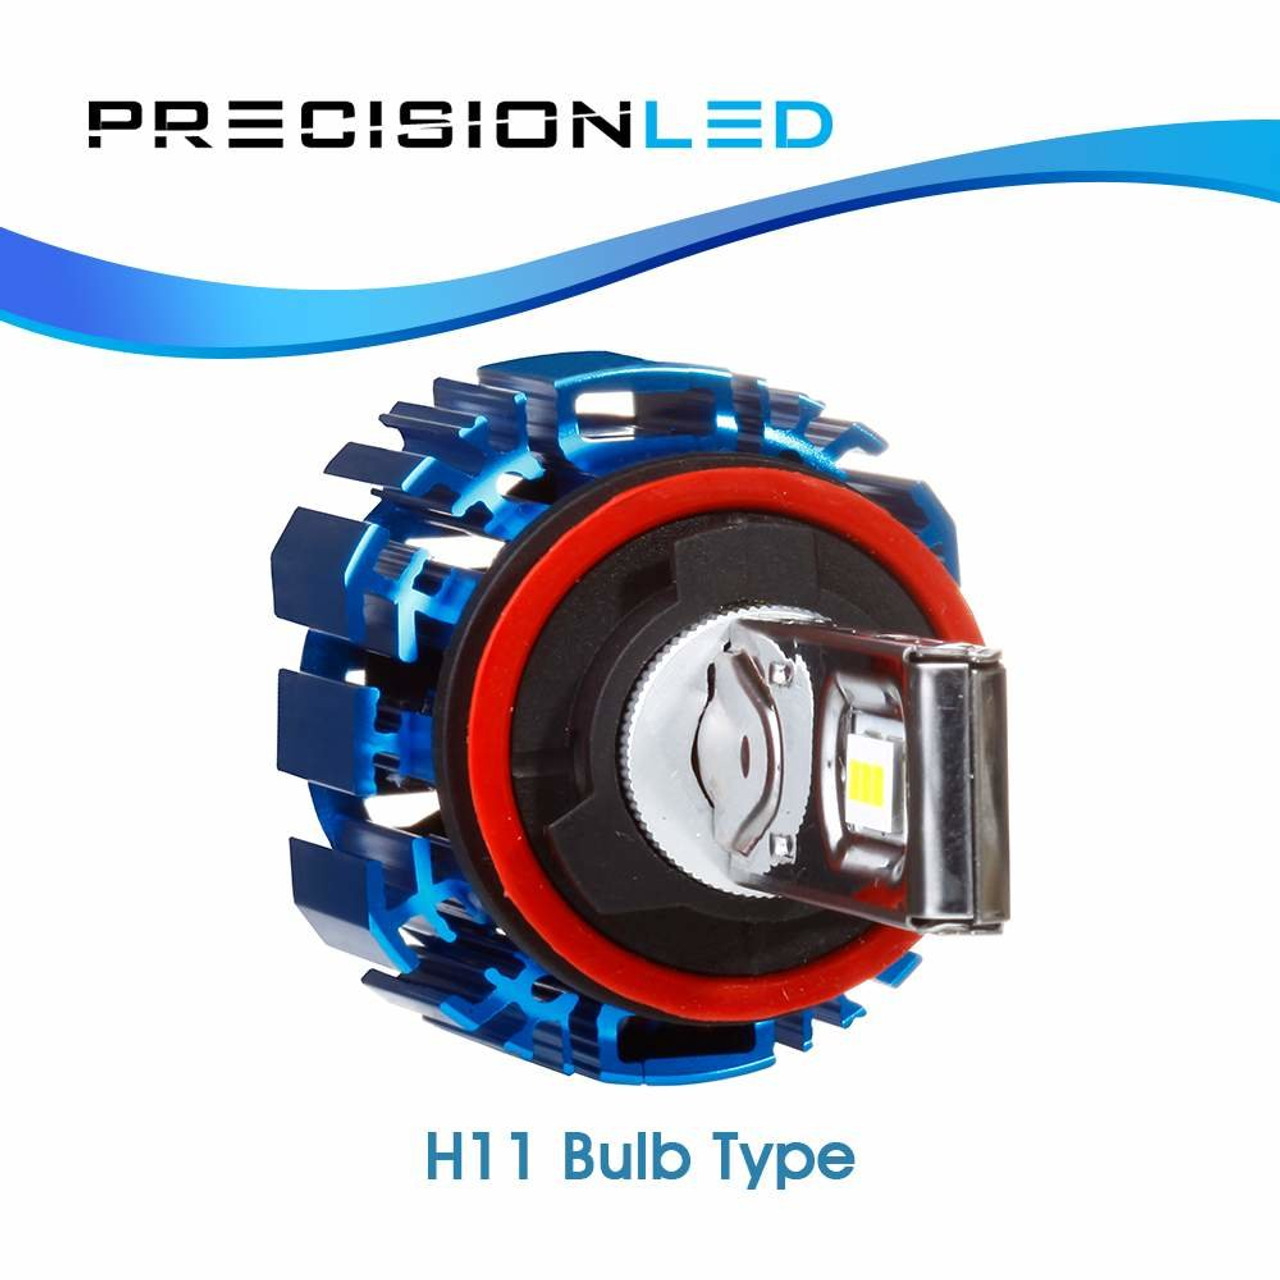 Hyundai Genesis Premium LED Headlight package (2009 - 2015)